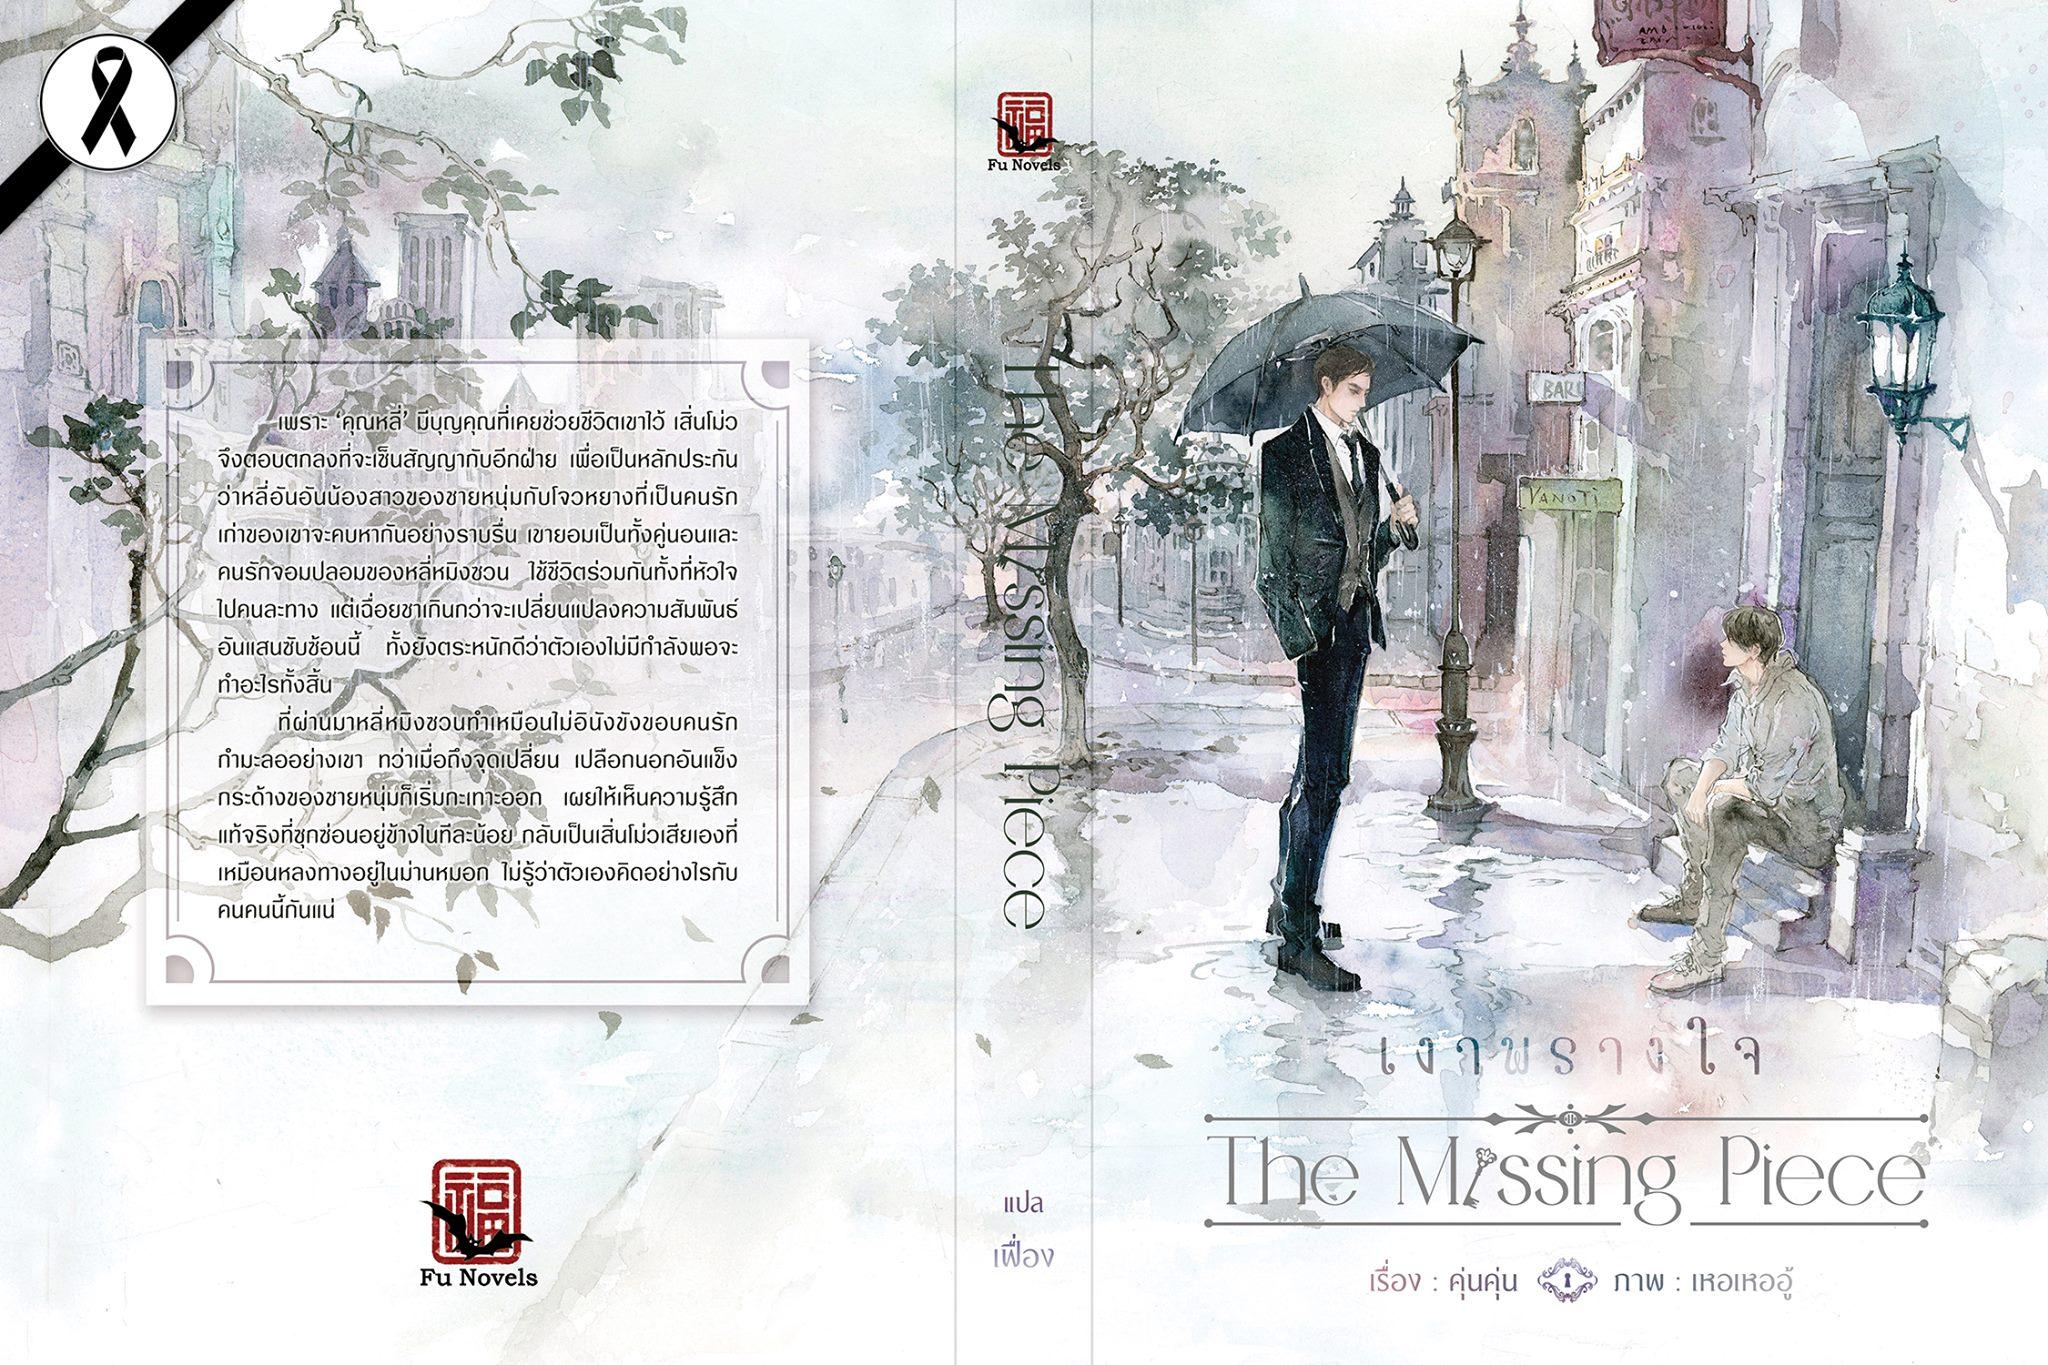 The Missing Piece (เงาพรางใจ) By คุ่นคุ่น มัดจำ 320b. ค่าเช่า 60b.